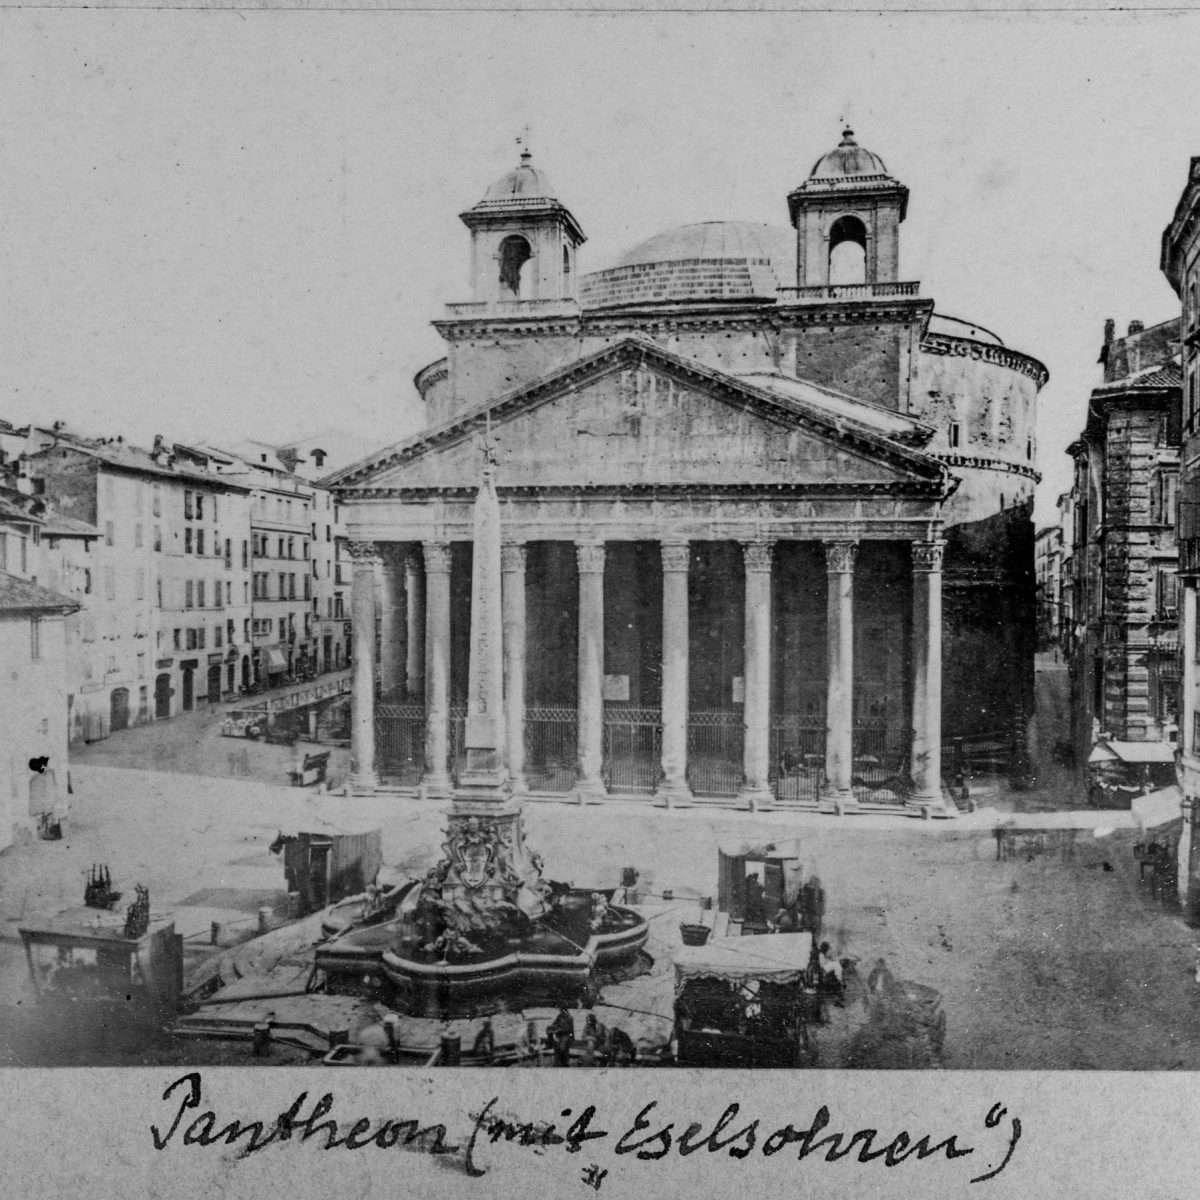 L-1090250 - Pantheon